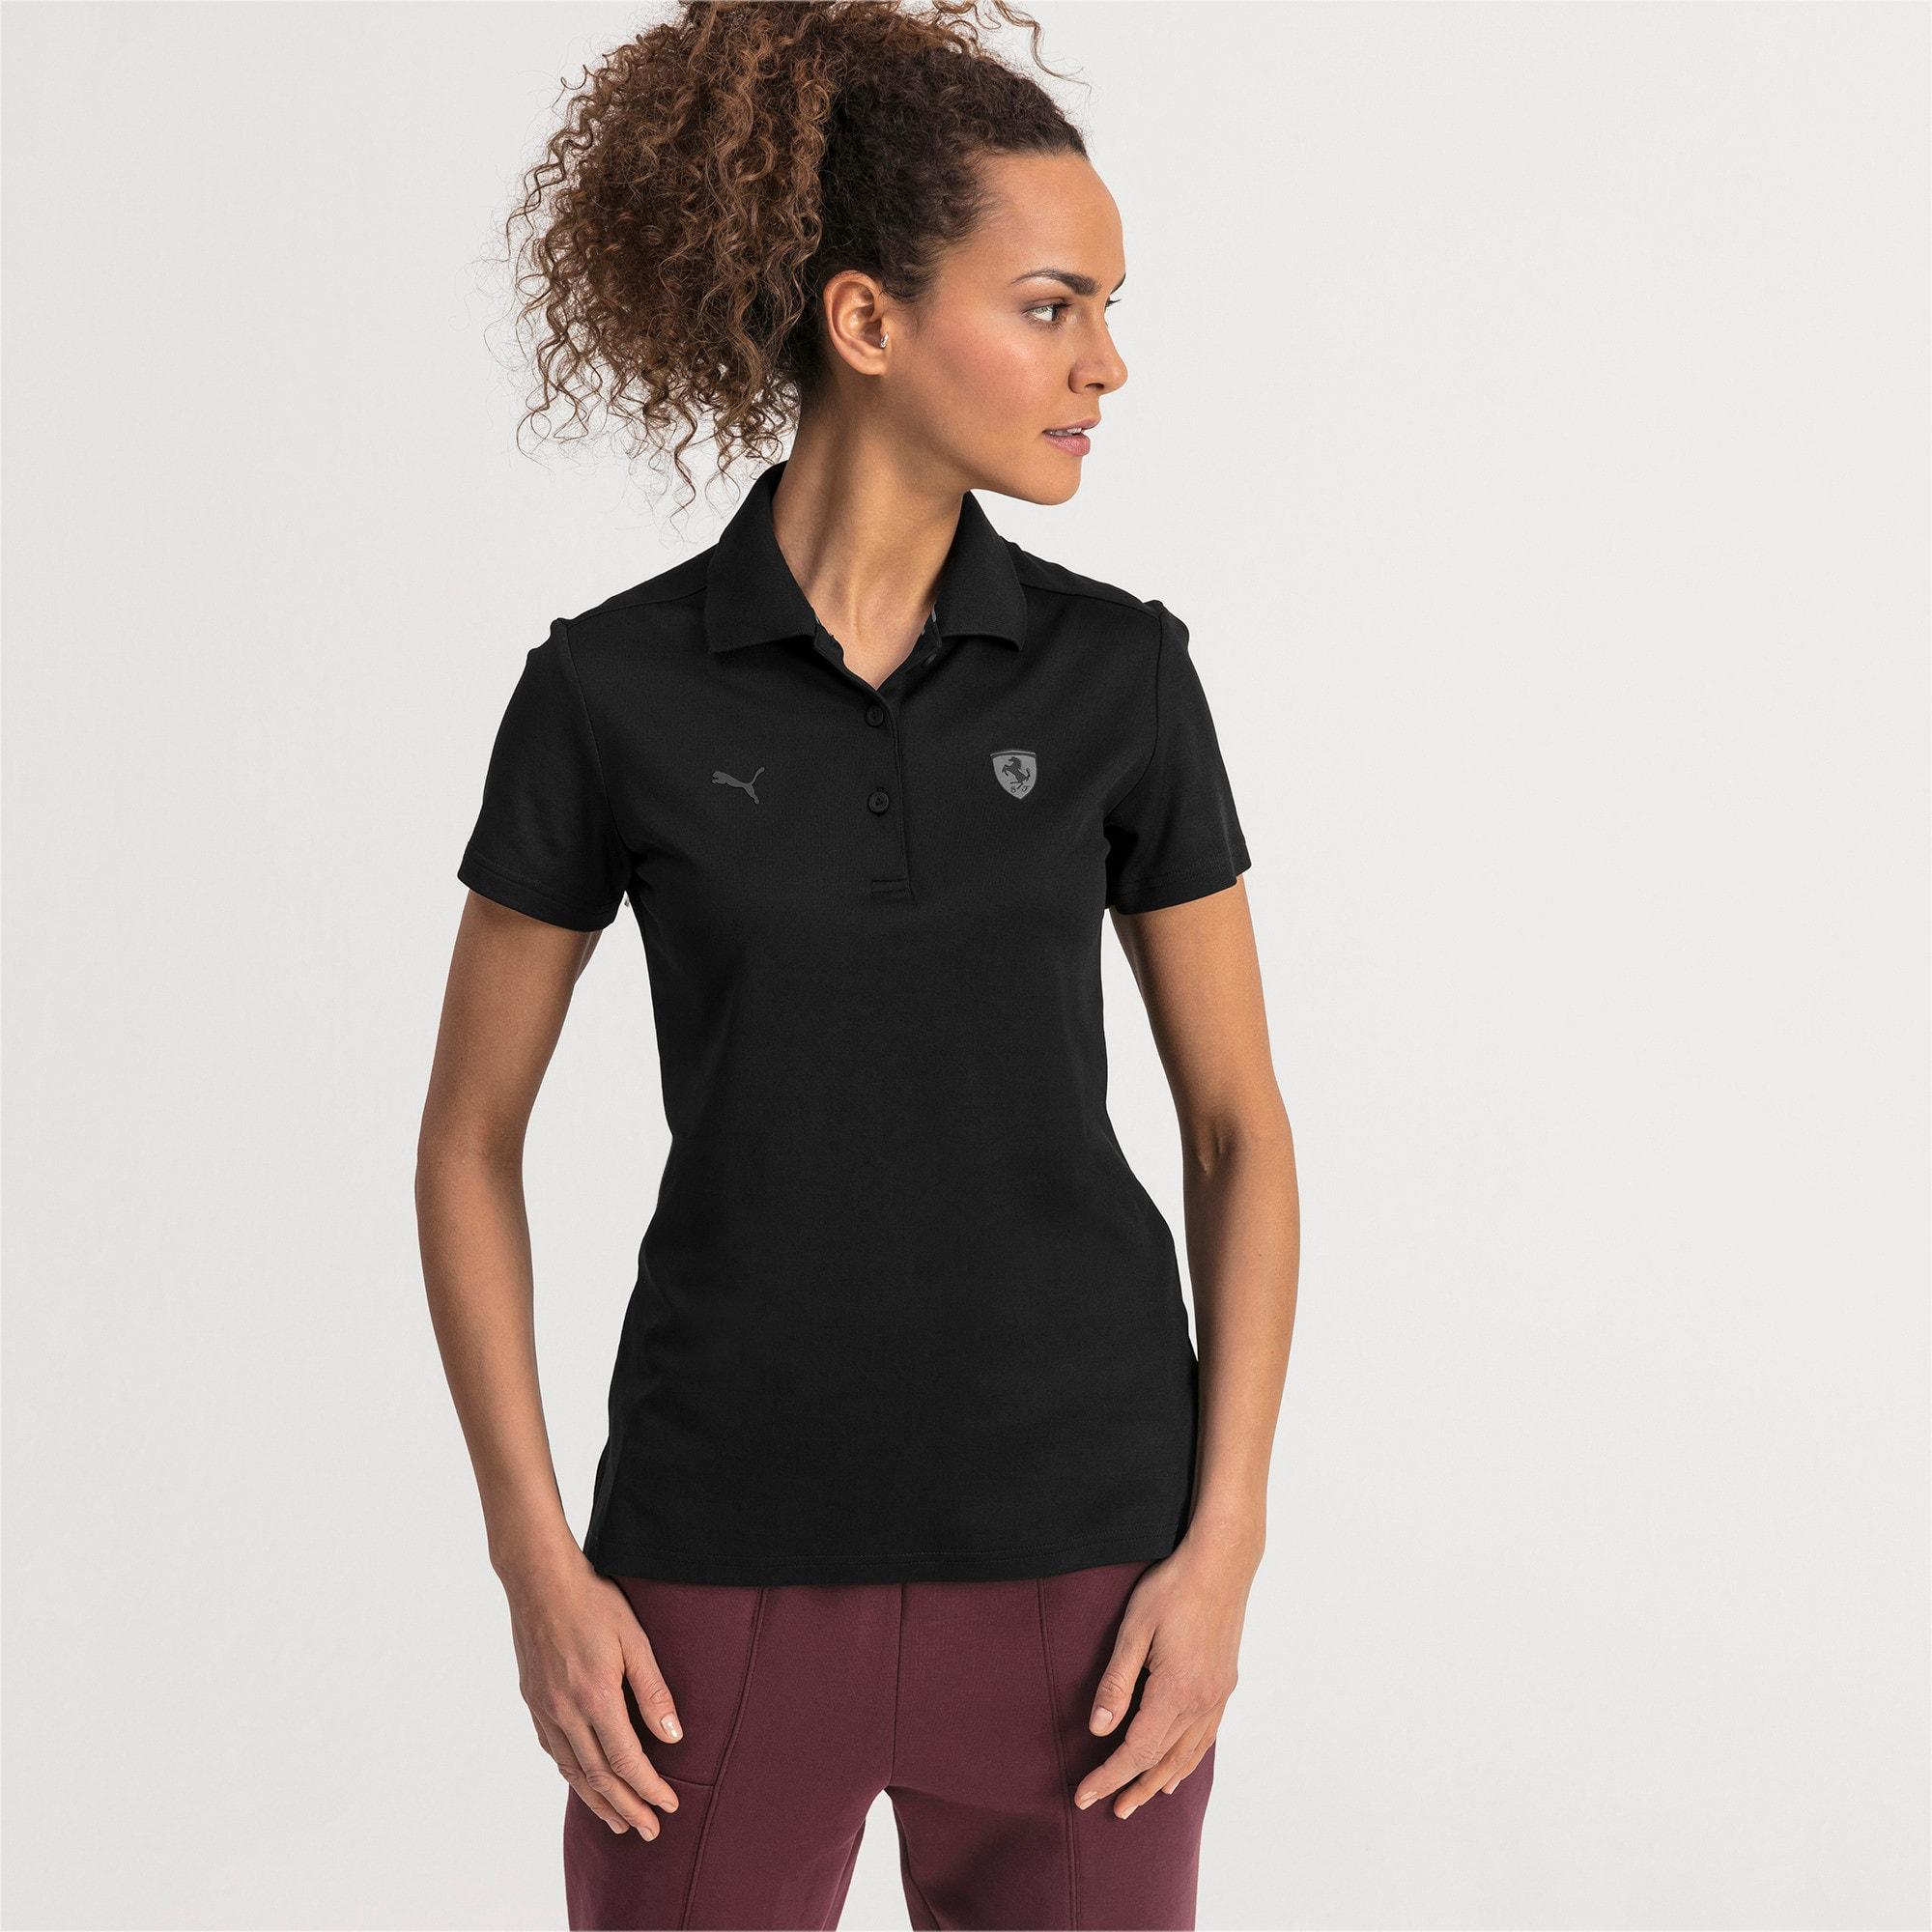 Thumbnail 1 of Ferrari Women's Polo Shirt, Puma Black, medium